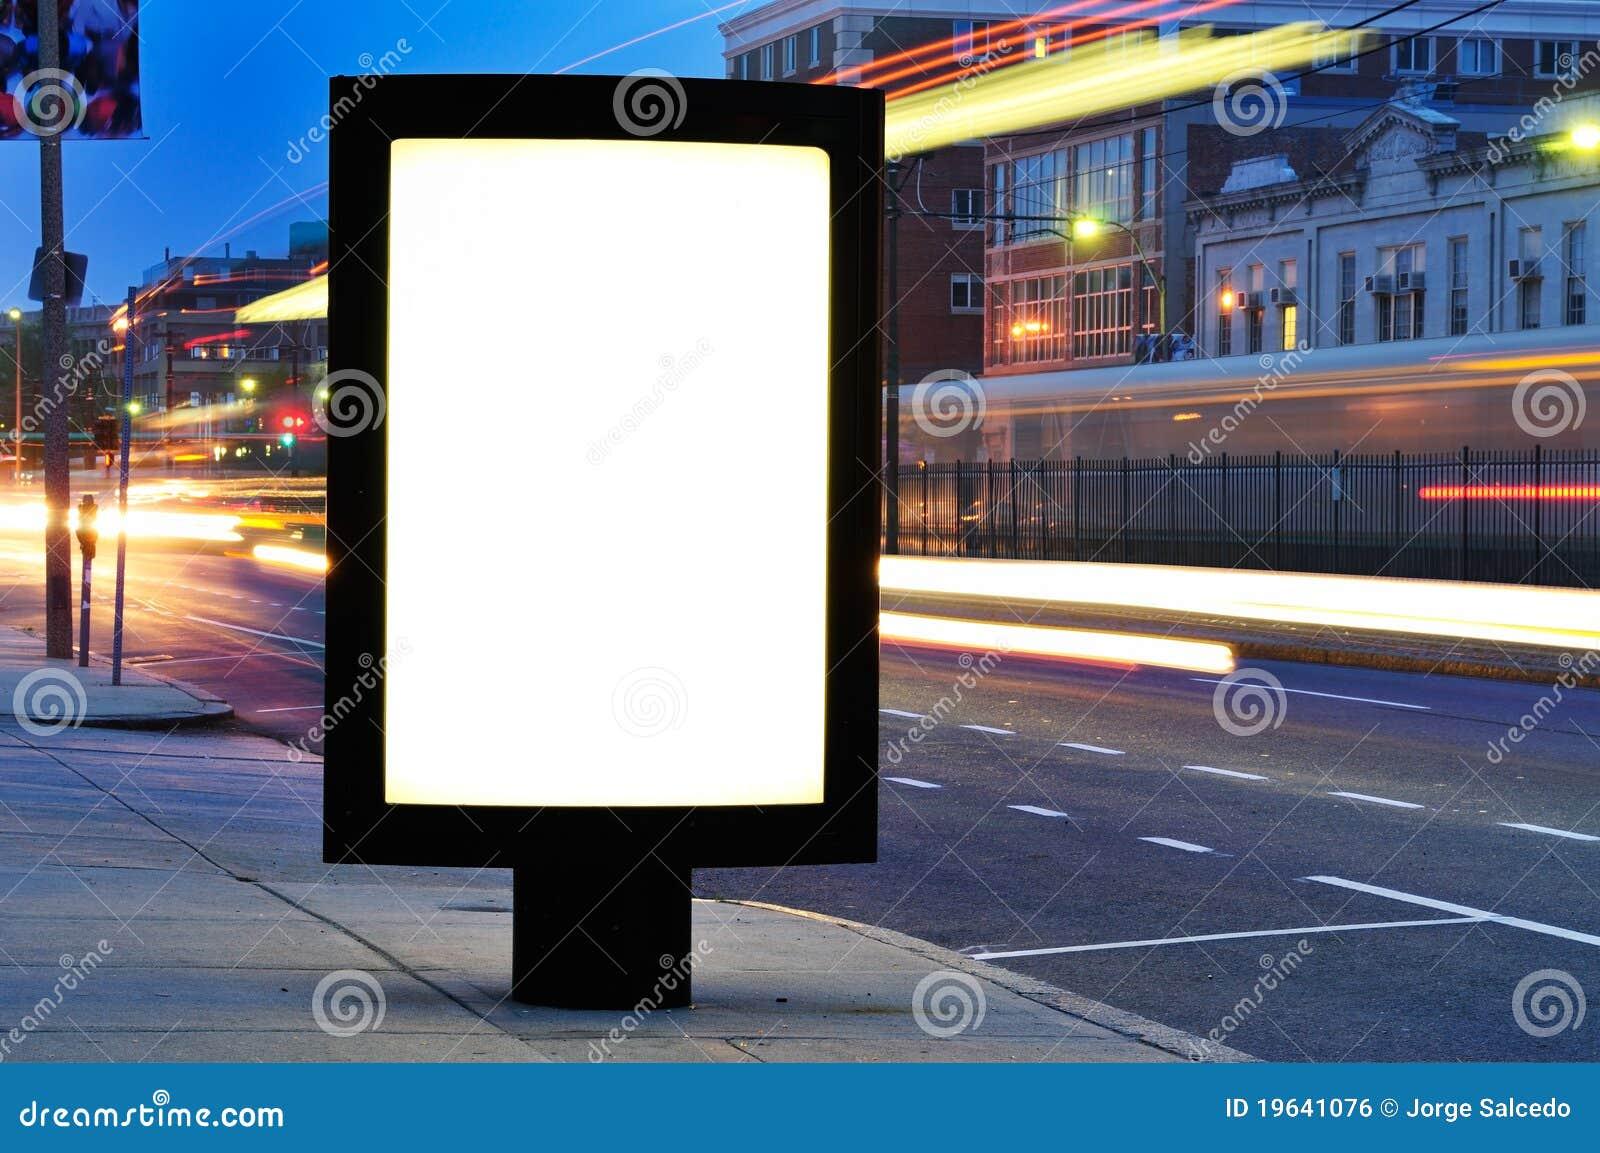 Blank Billboard On City Street At Night Stock Photo